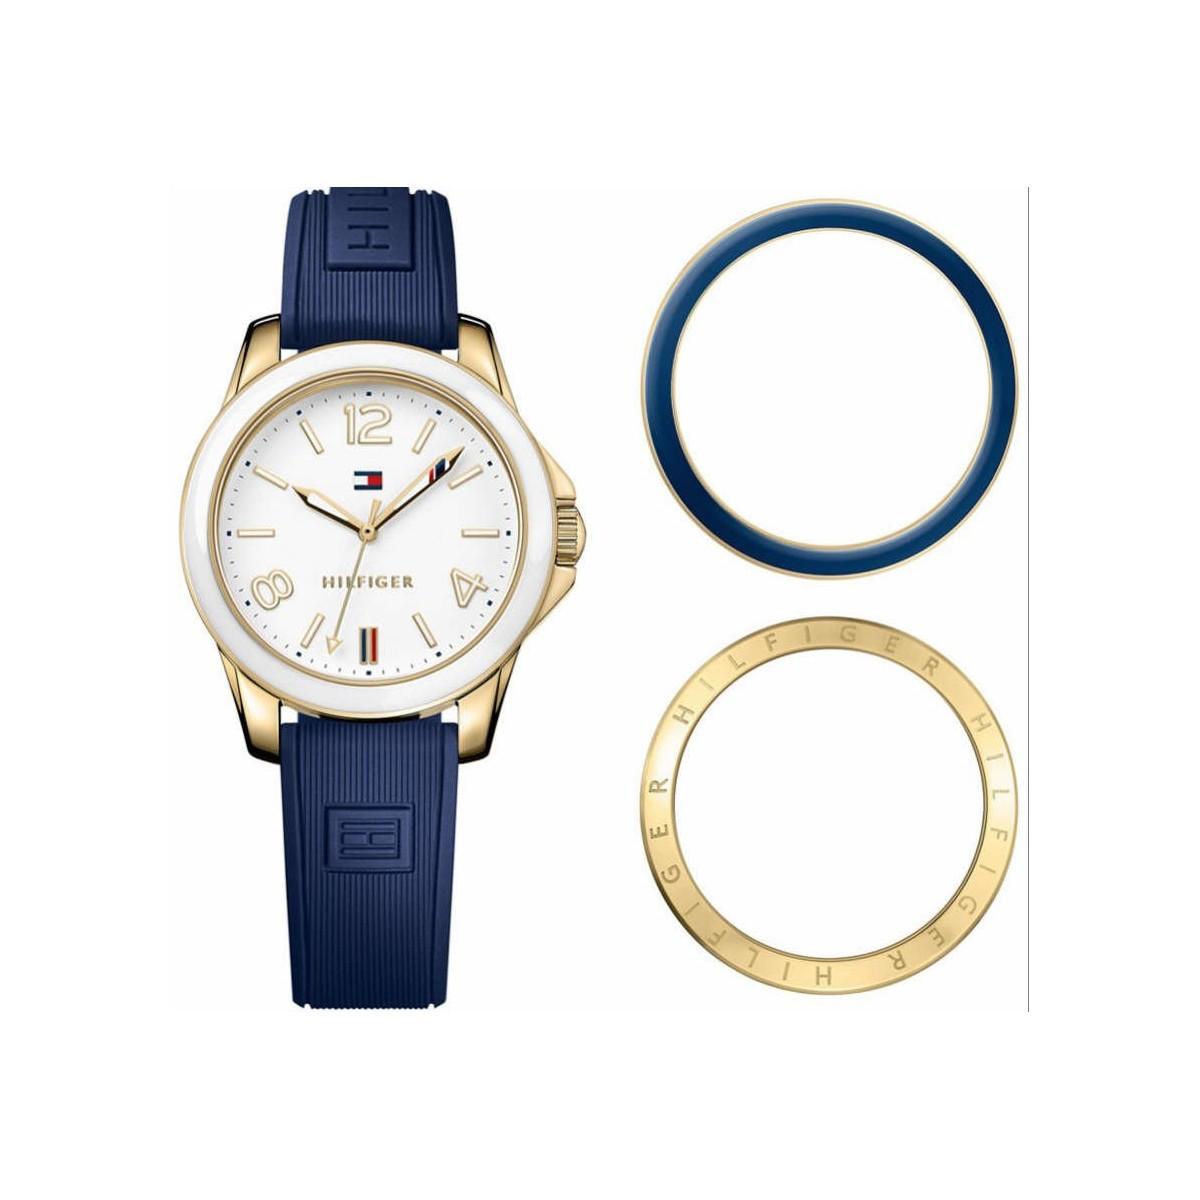 https://www.gaberjoyeria.com/3205-thickbox_default/reloj-tommy-hilfiger-1781679.jpg